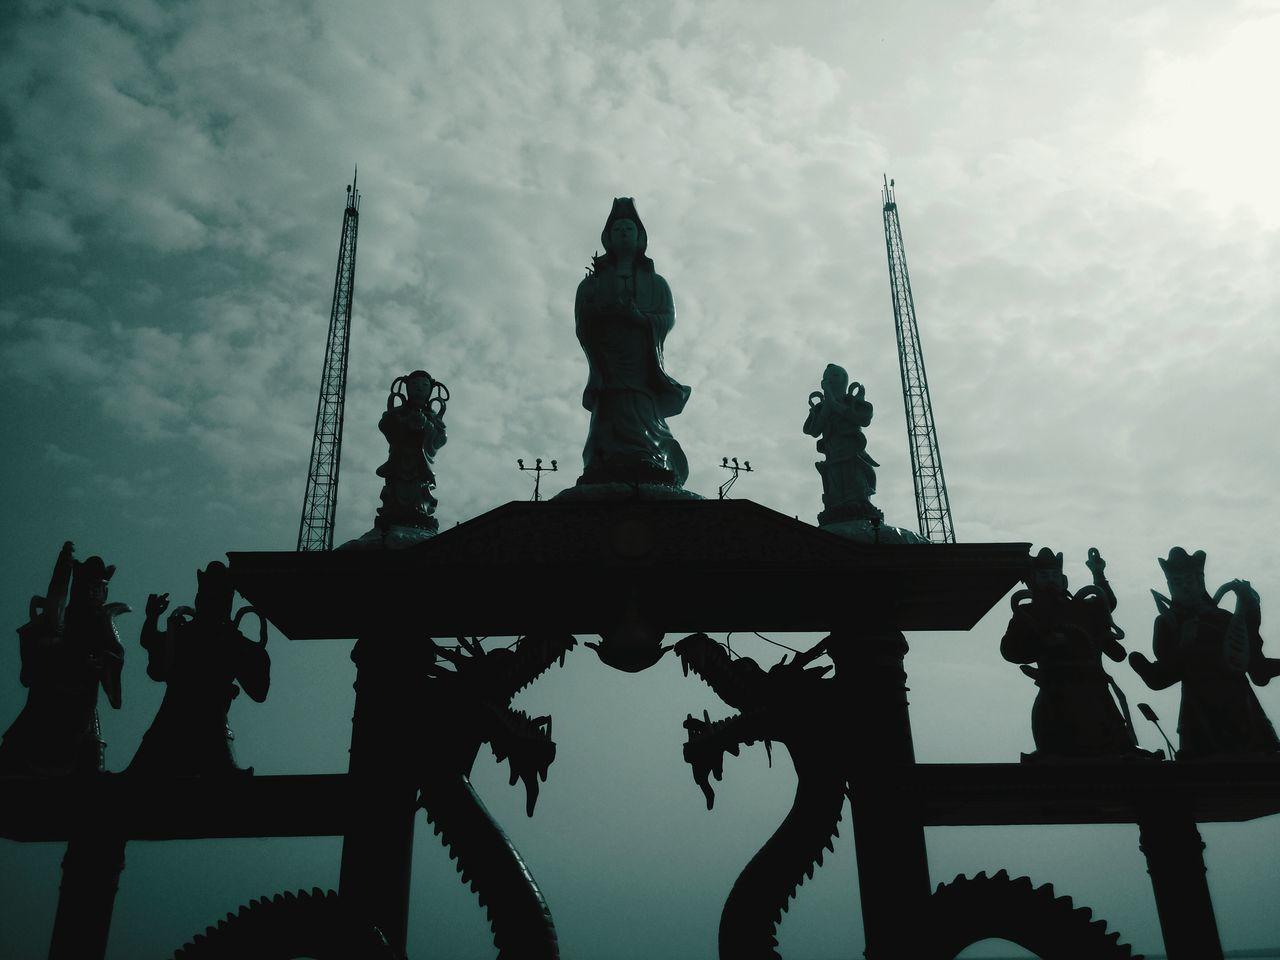 Kwan In, Vihara Kenjeran Ria, Surabaya. Statue Goddess Kwan In Surabaya Vihara Dragon Stone Statue